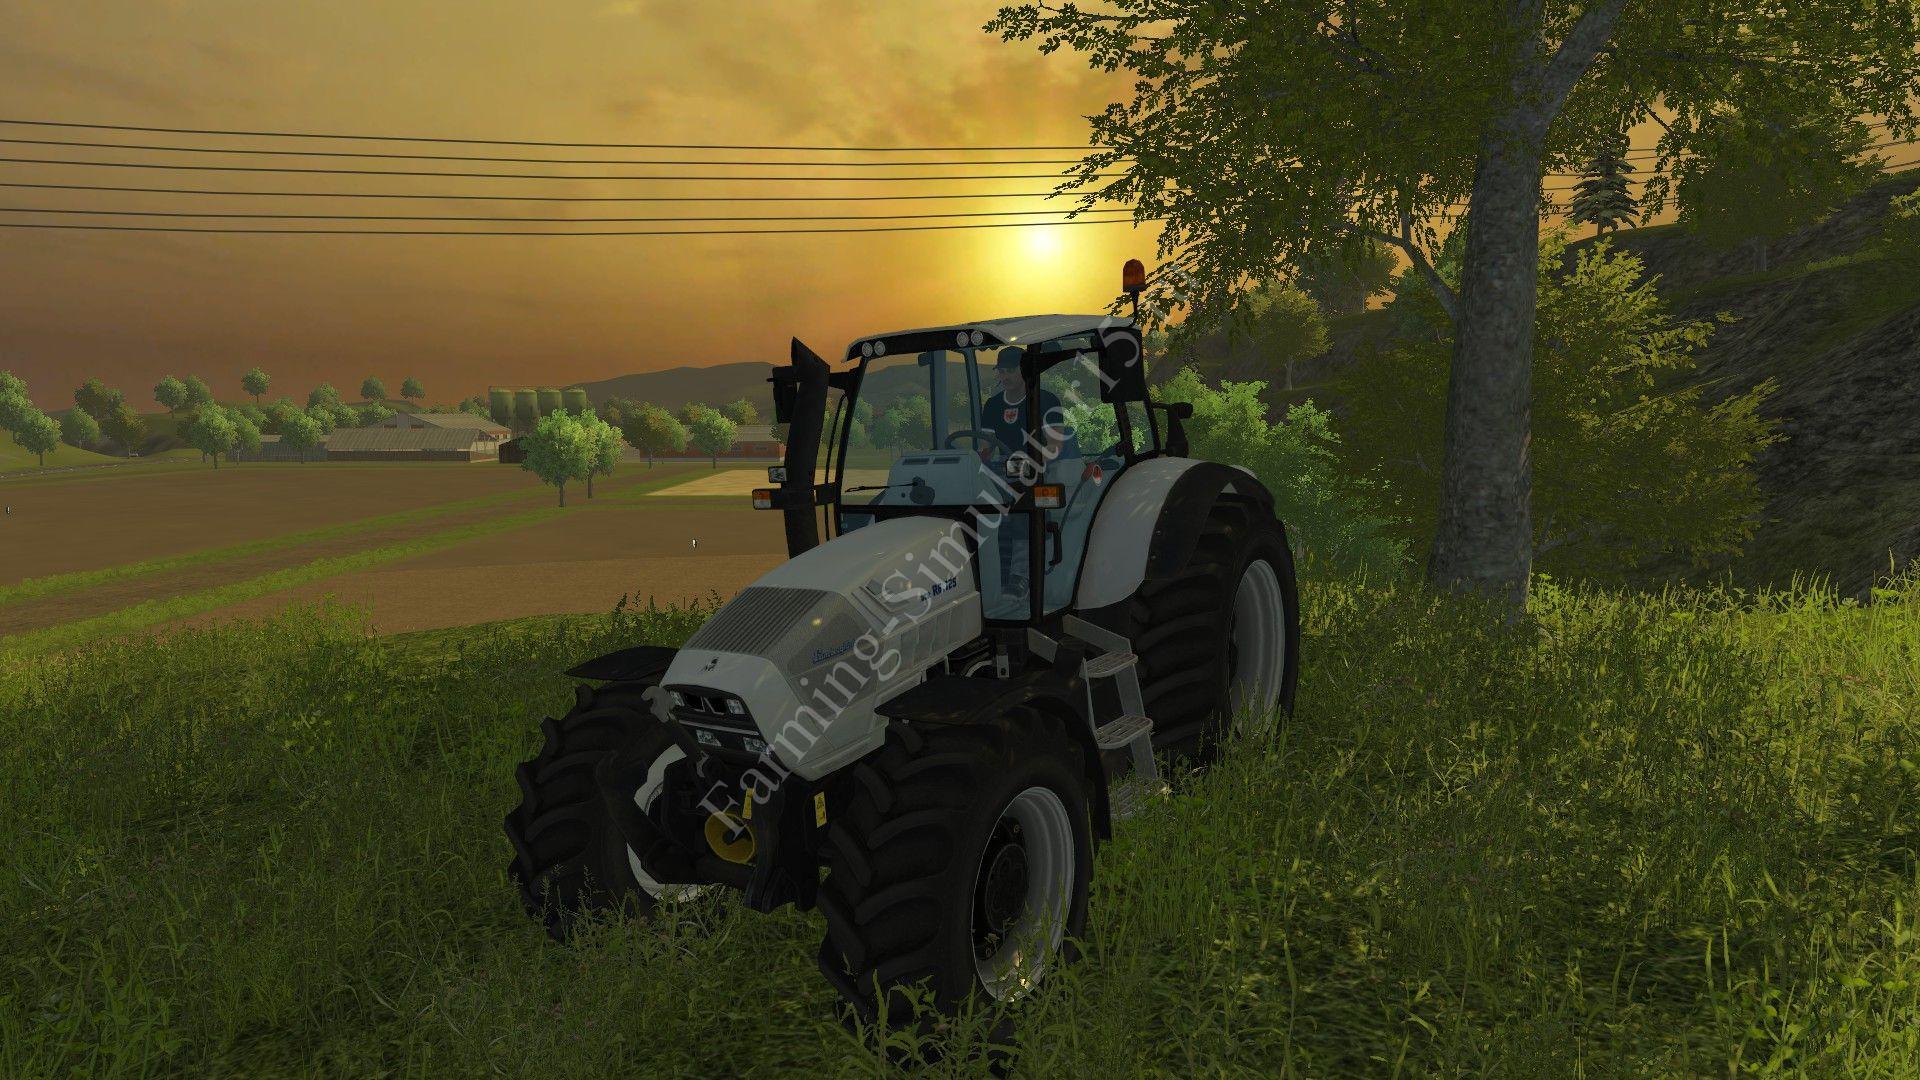 Мод трактора Lamborghini R6 125 v 1.0 More Realistic Farming Simulator 2013, Farming Simulator 13